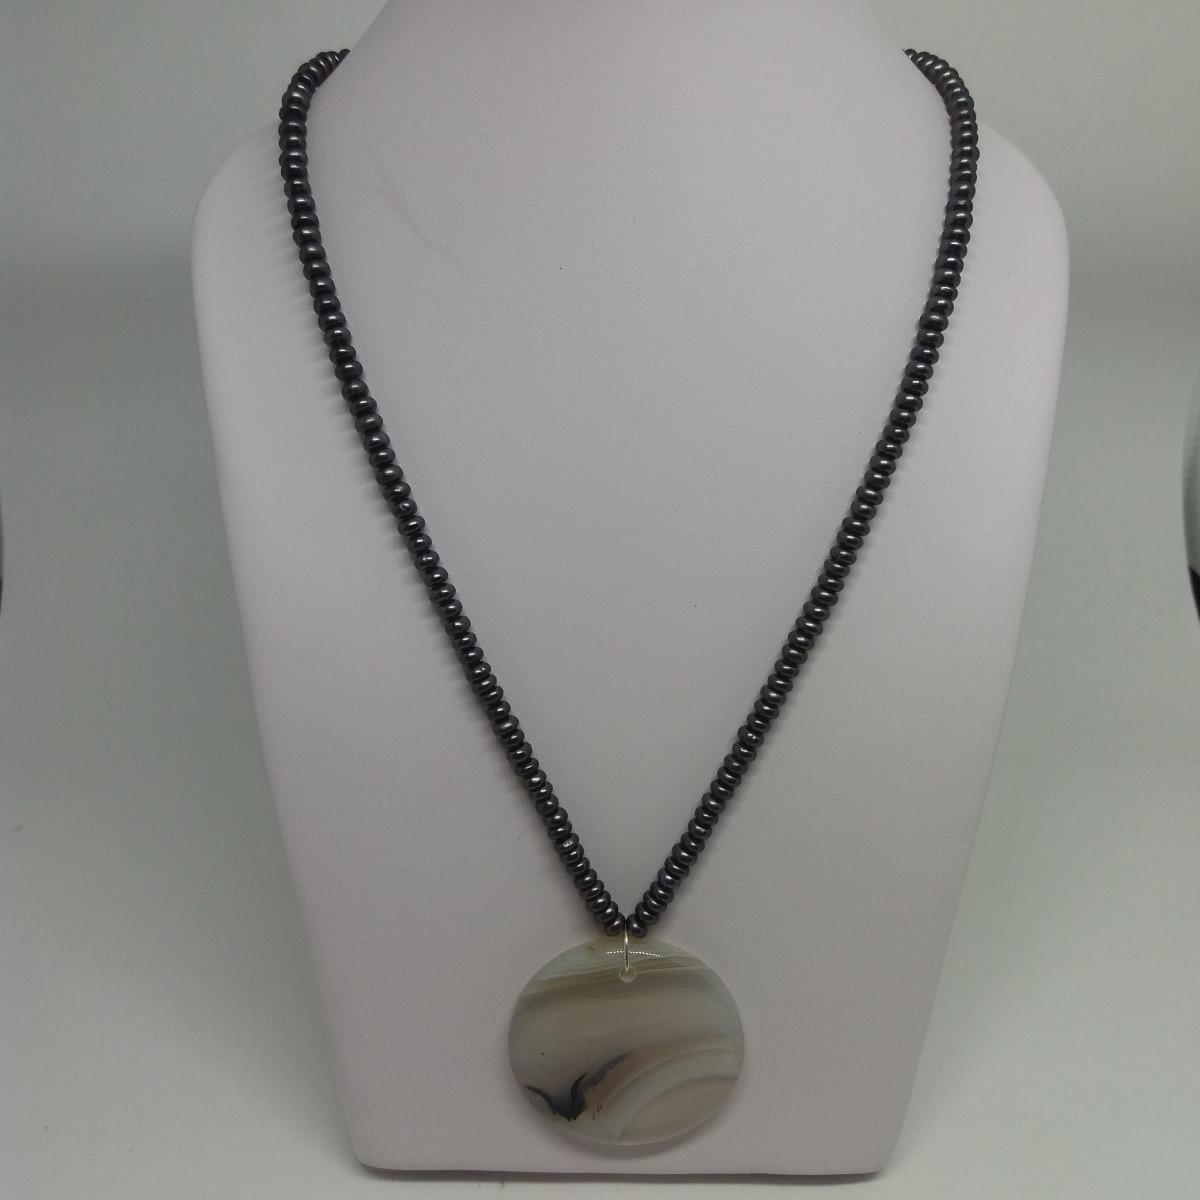 c1531d8dfb8d2 colar pérola baby pingente ágata pedra natural e brinde! Carregando zoom.